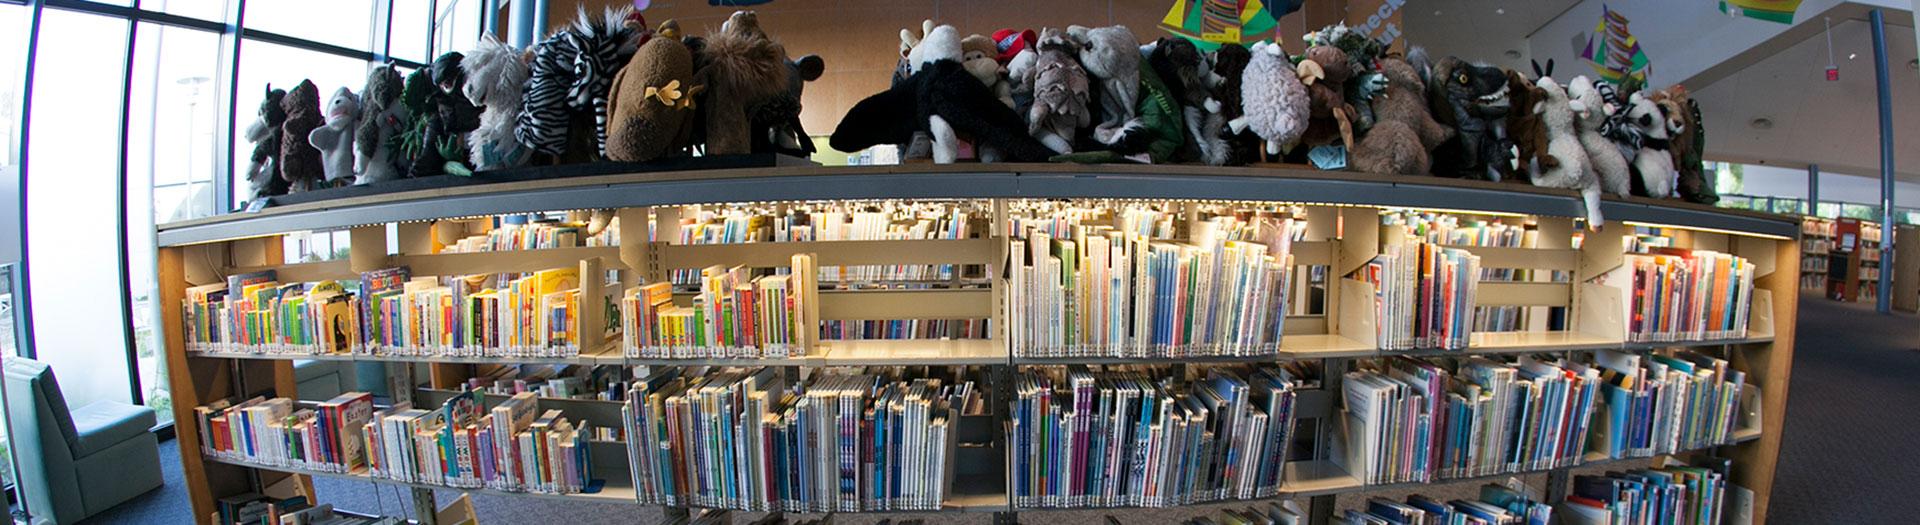 Thousand Oaks, CA | Library